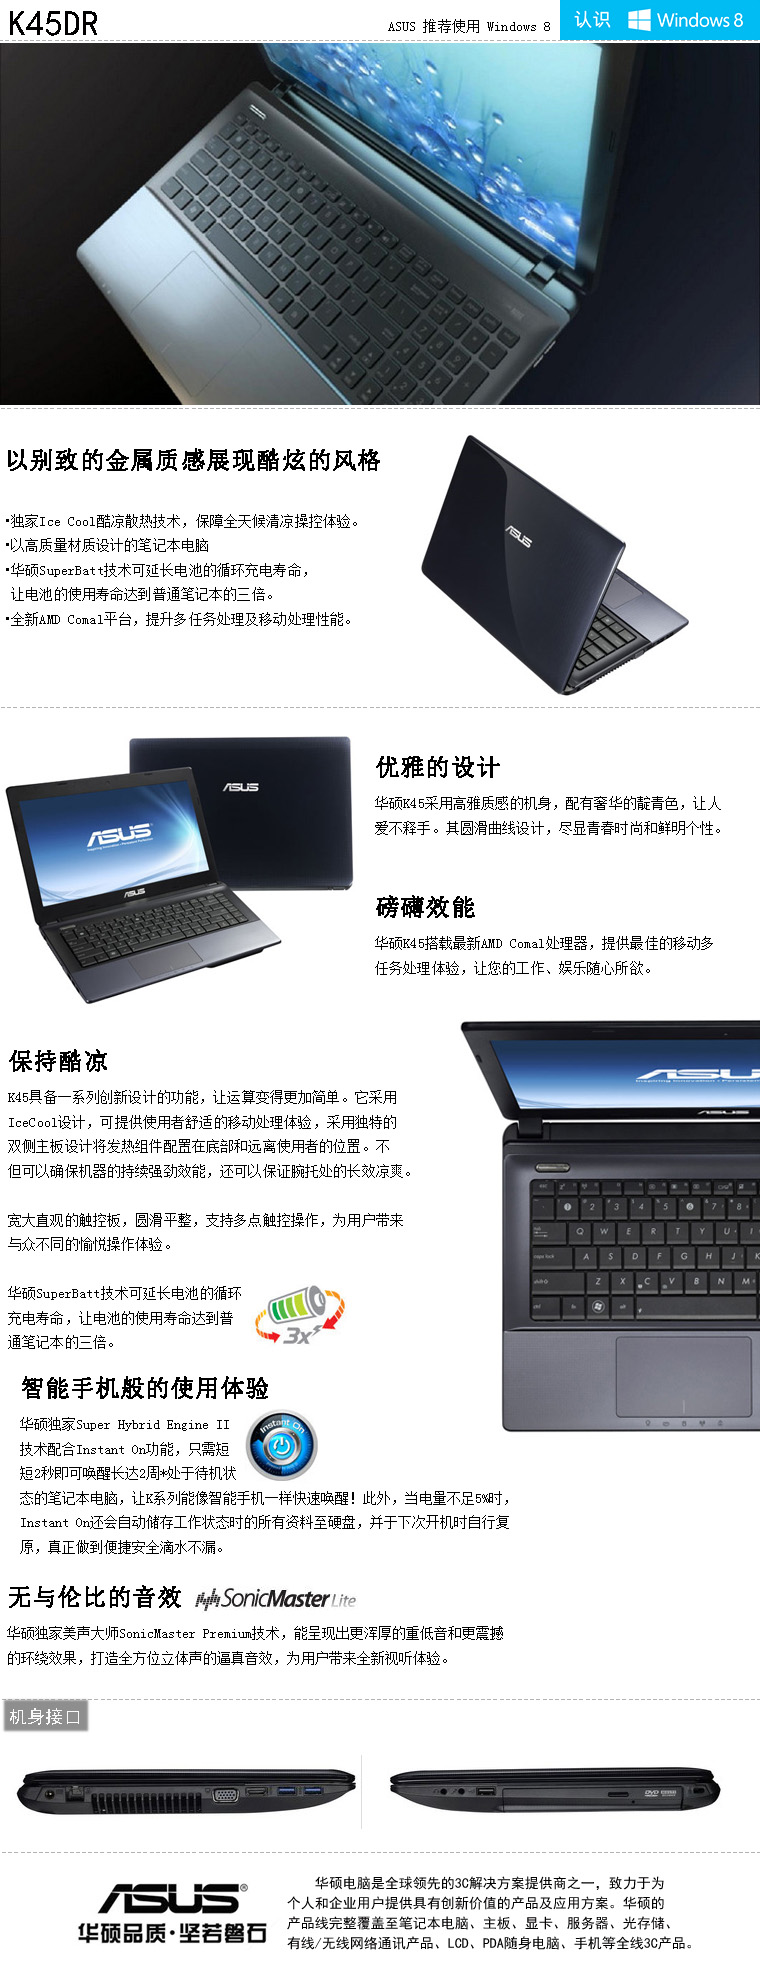 华硕(asus) k45e45dr-sl 14英寸笔记本 (a8-4500m 2g